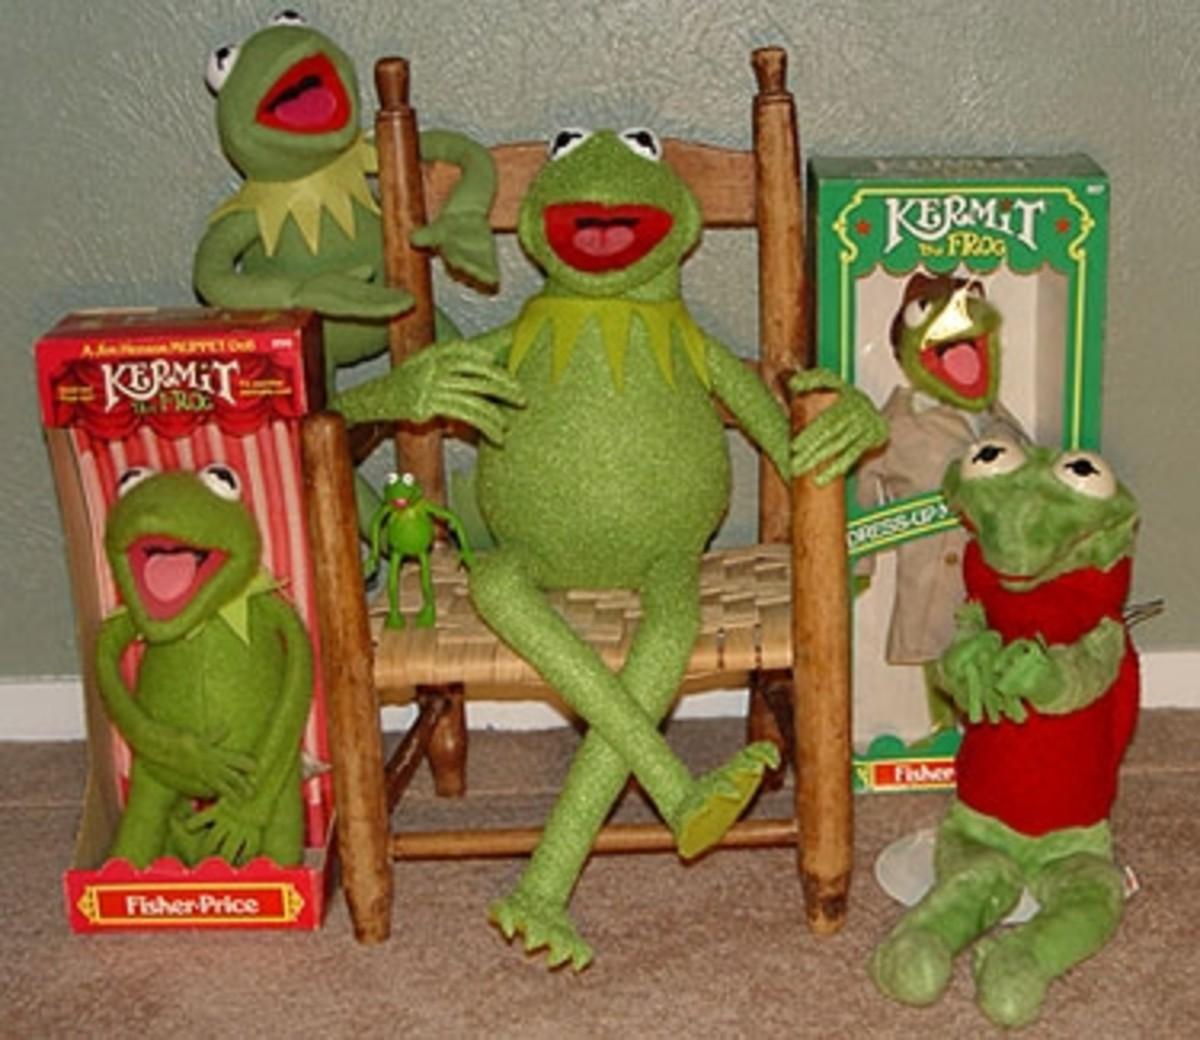 Kermit Frog Adidas Shoes